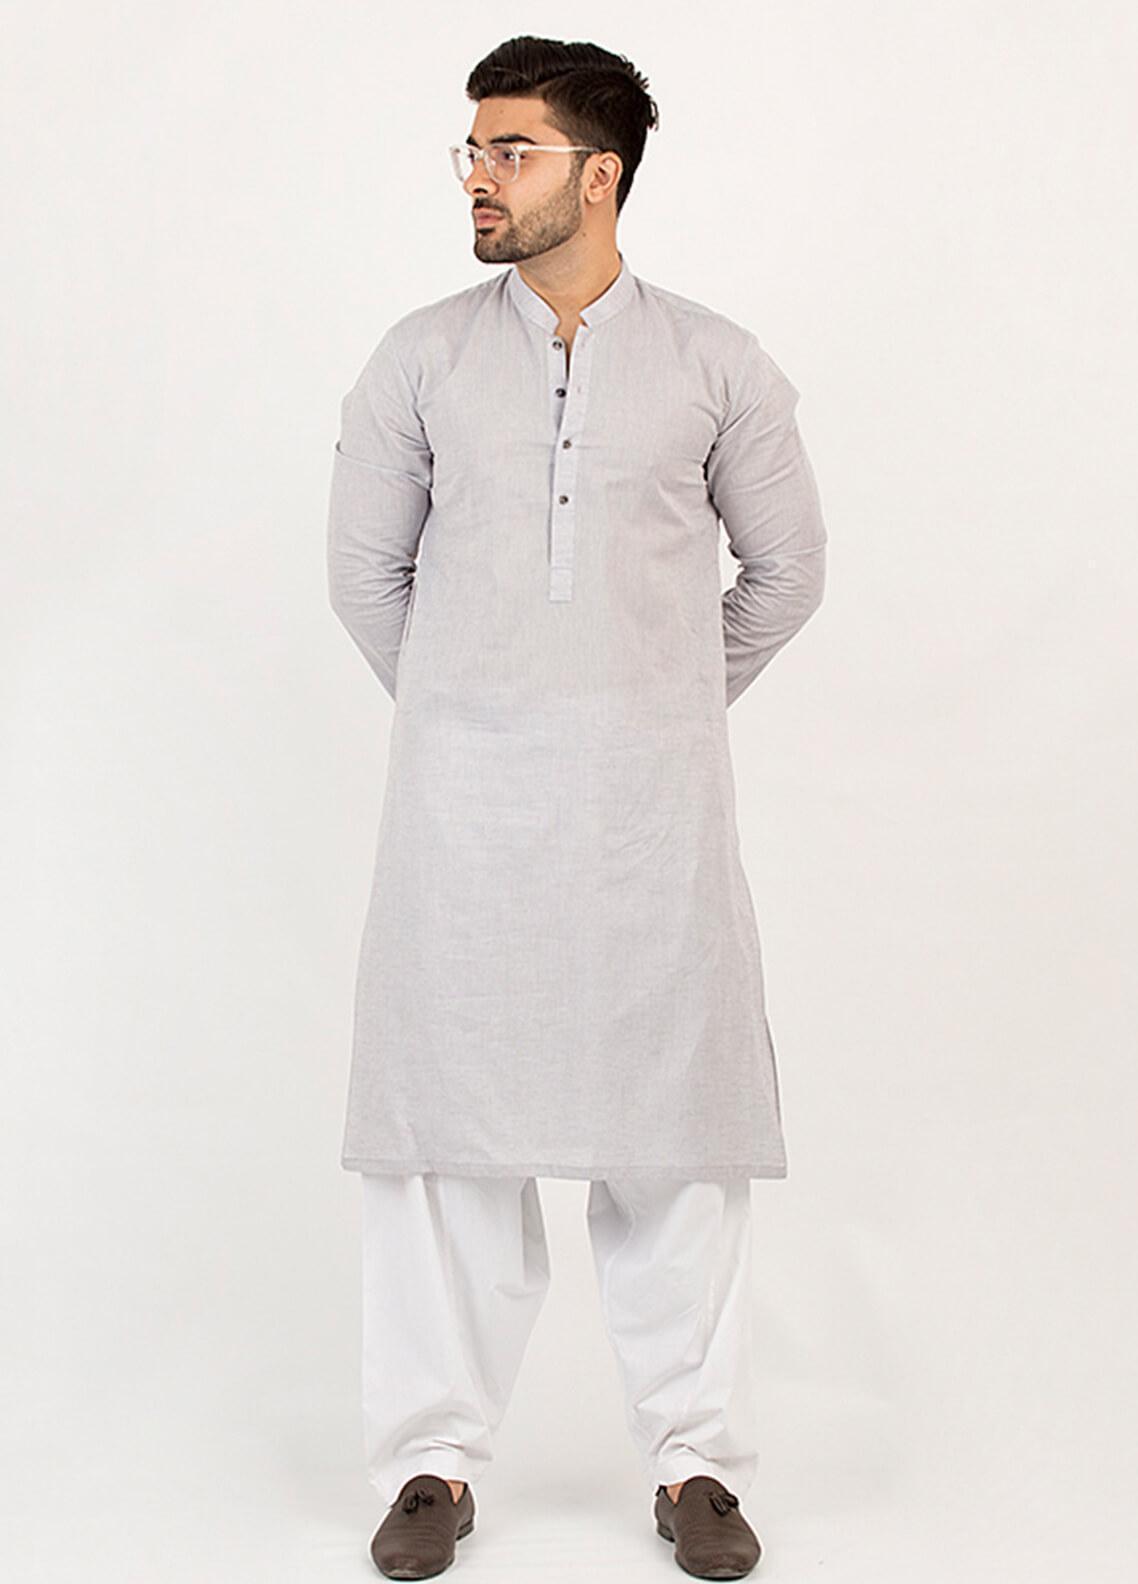 Shahzeb Saeed Wash N Wear Formal Kurta for Men - Grey KURTA-103